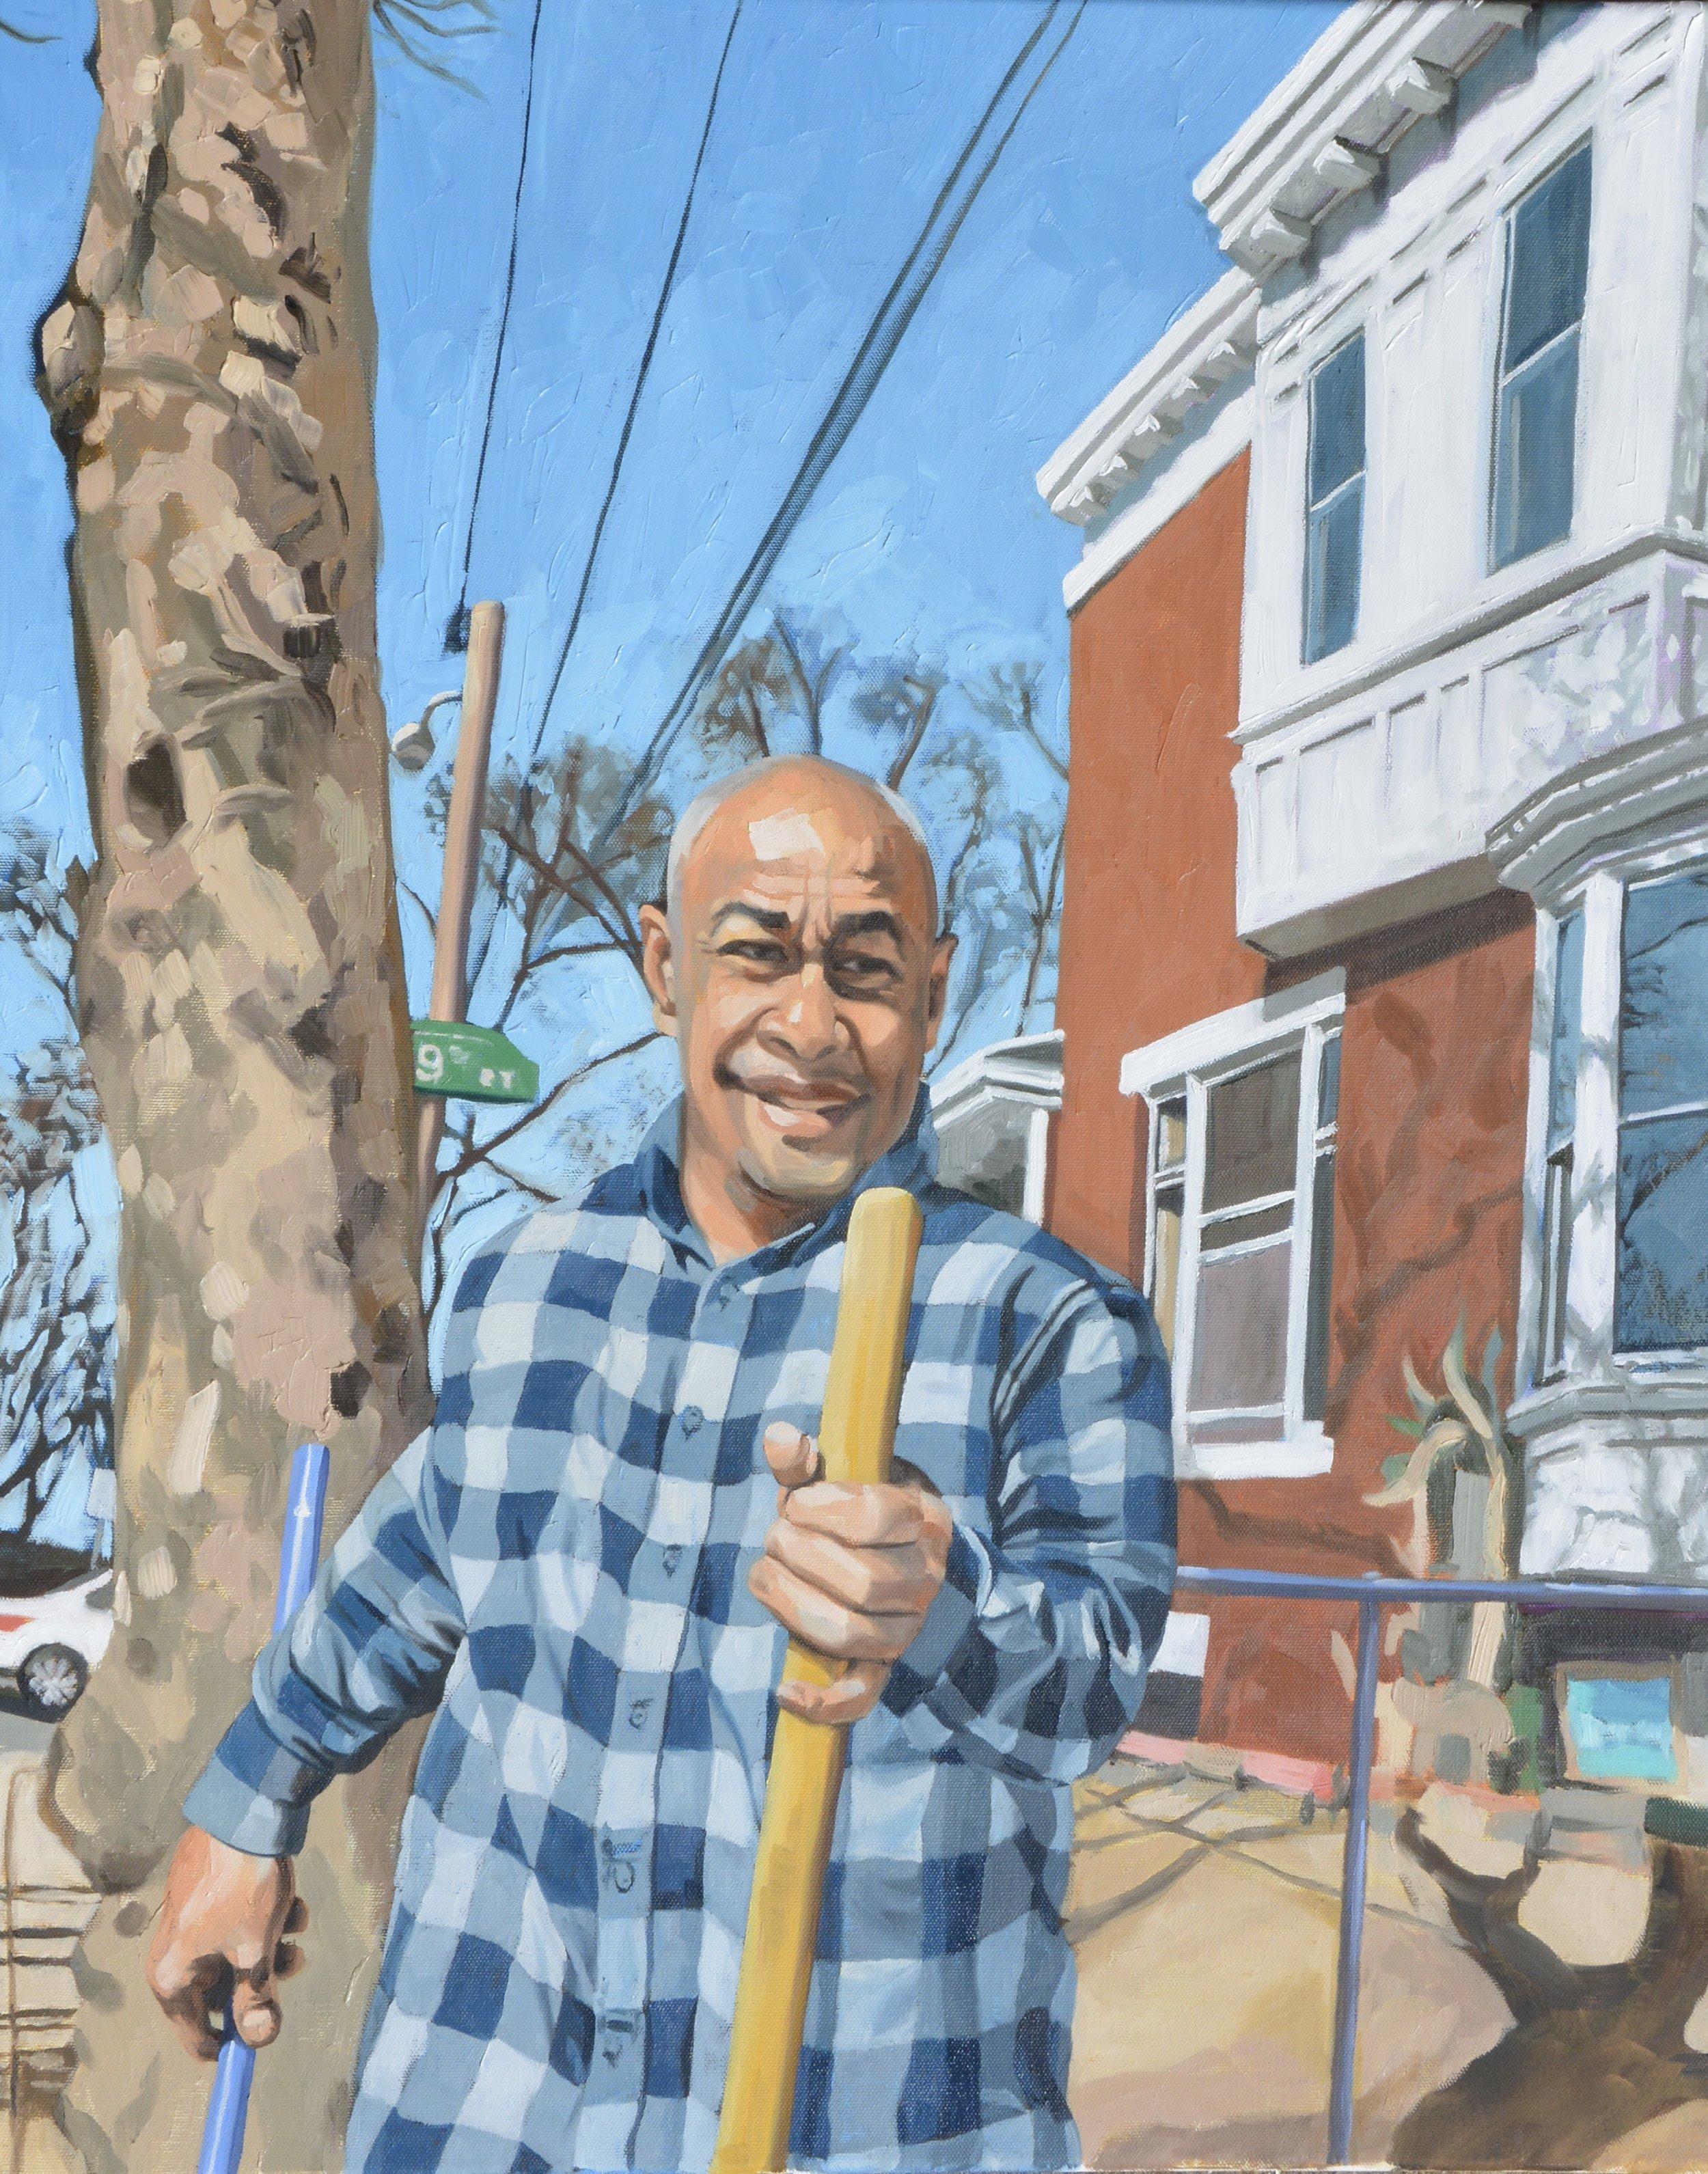 "Copy of Good Neighbors (Ruben), 24x30"", oil on canvas, 2017"